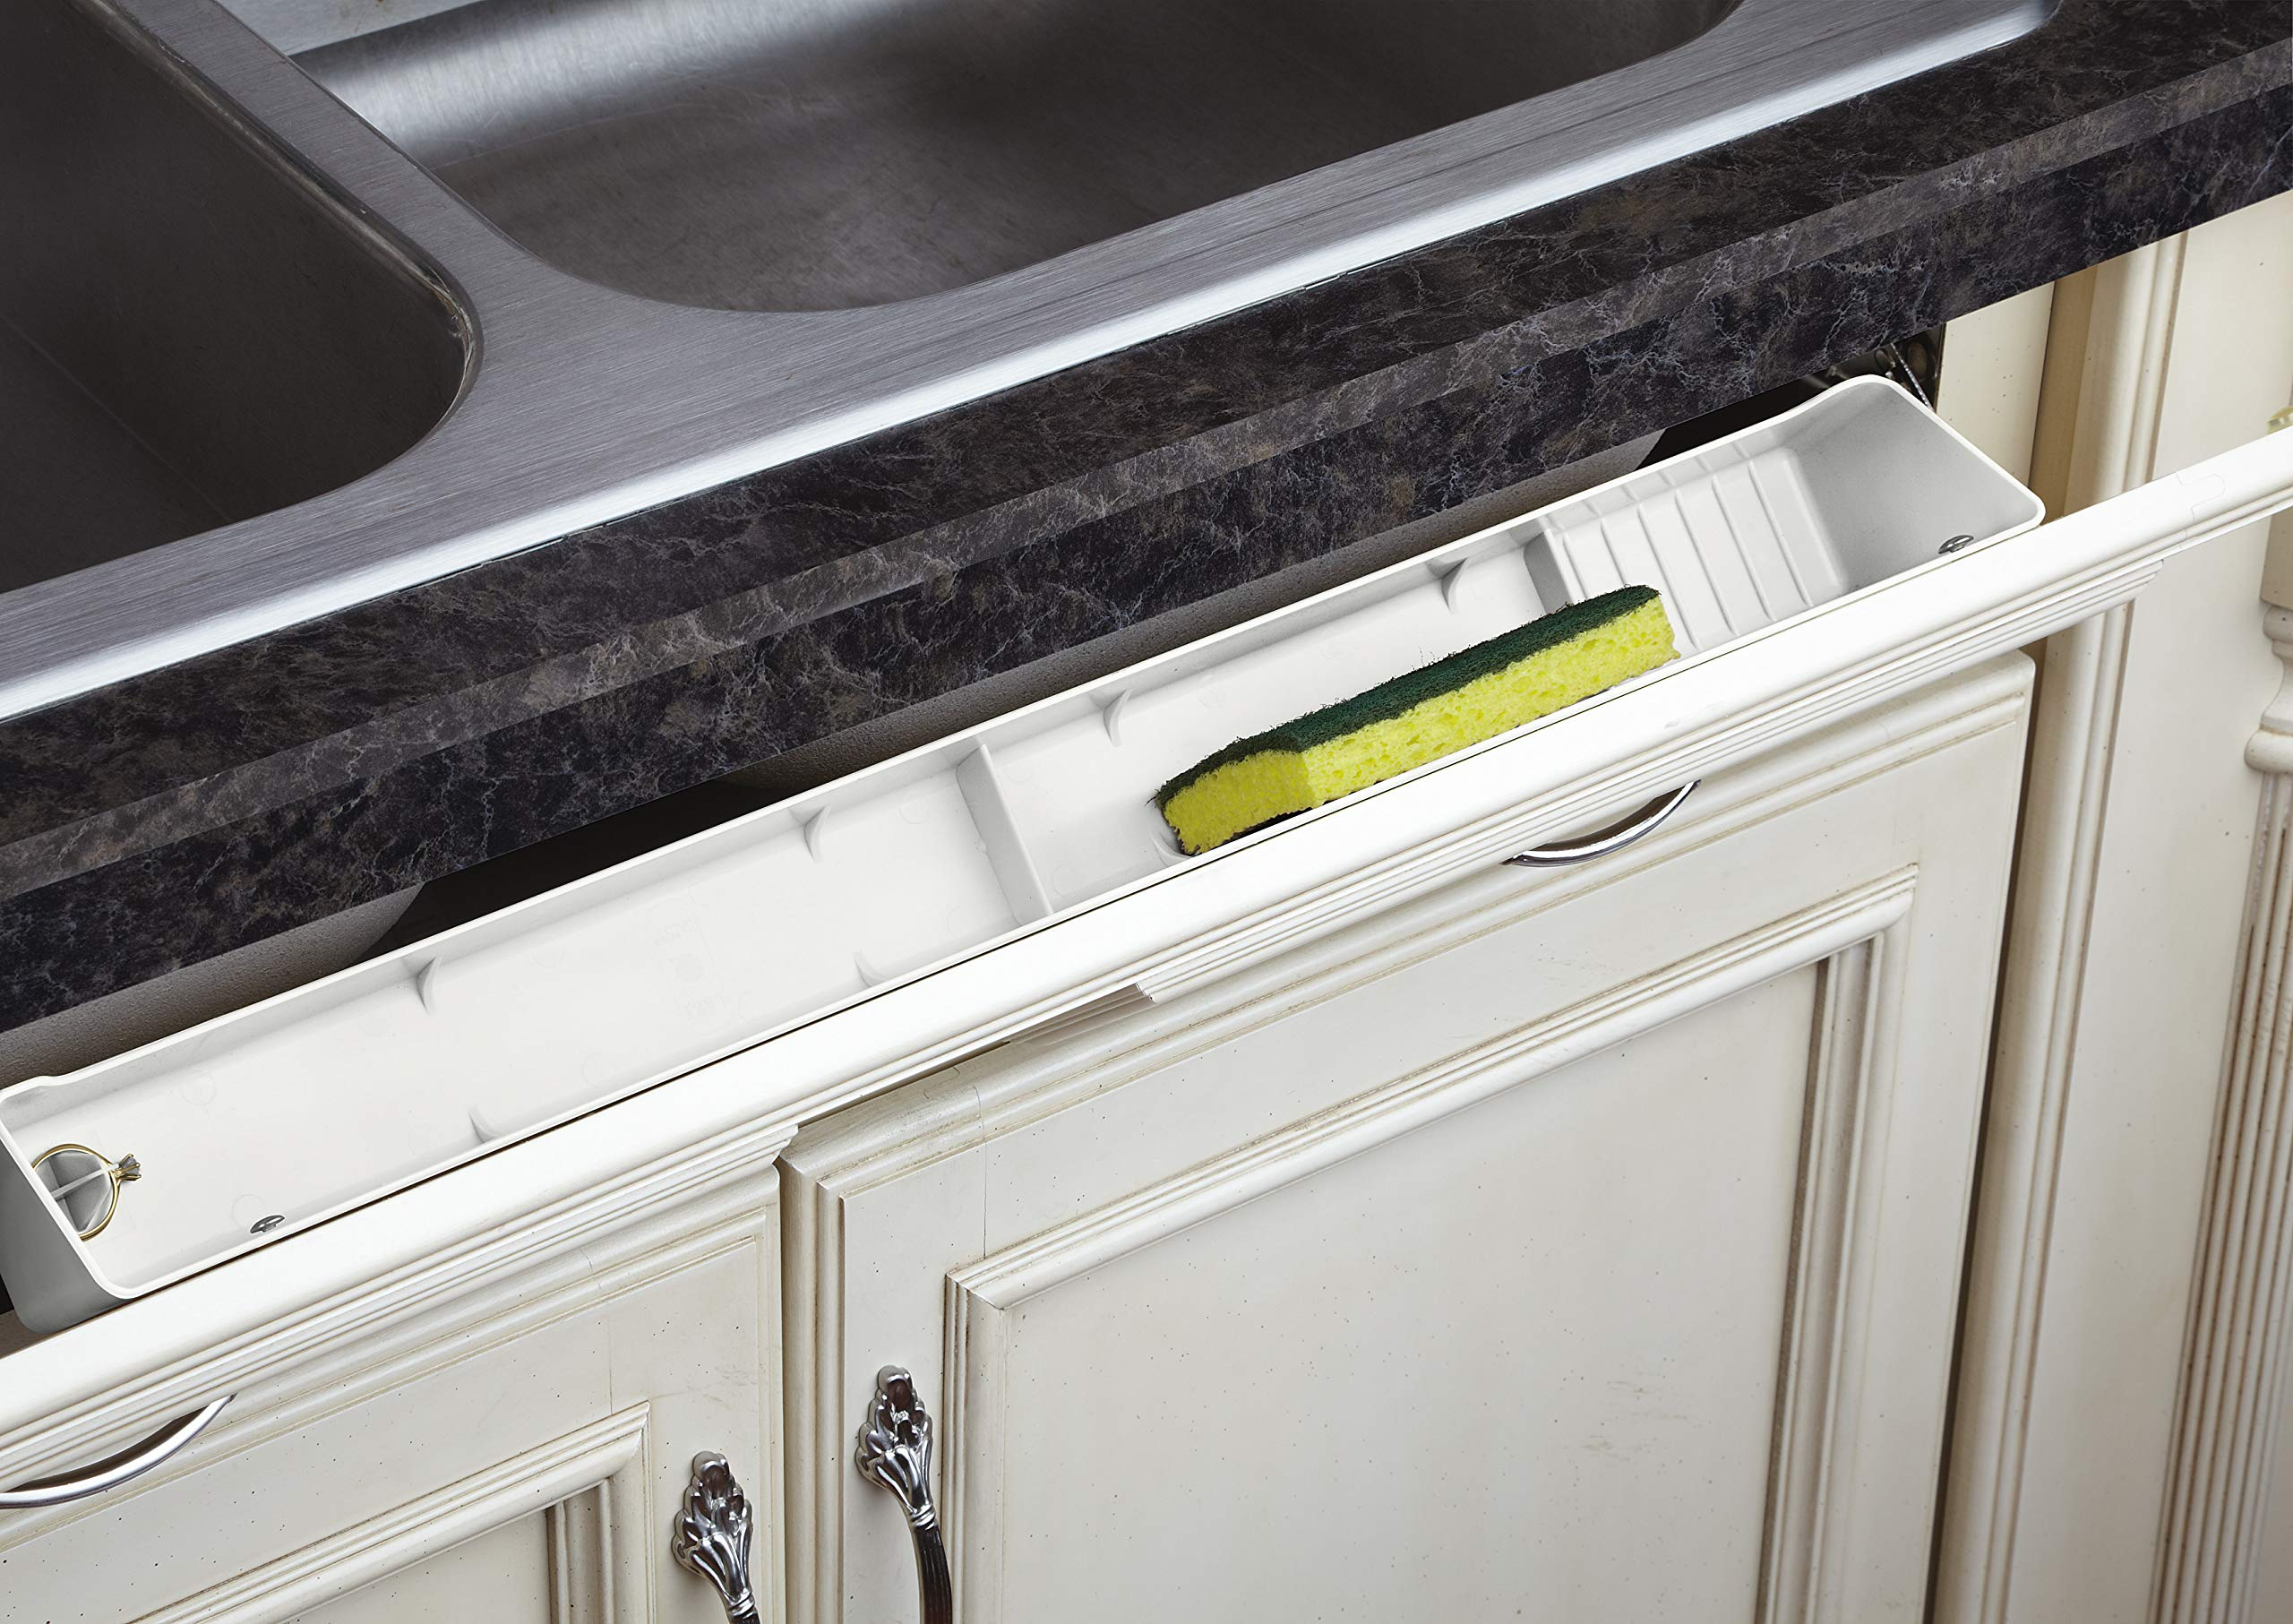 Rev-A-Shelf 22 in White Polymer Lazy Daisy Tip-Out Tray, by Rev-A-Shelf